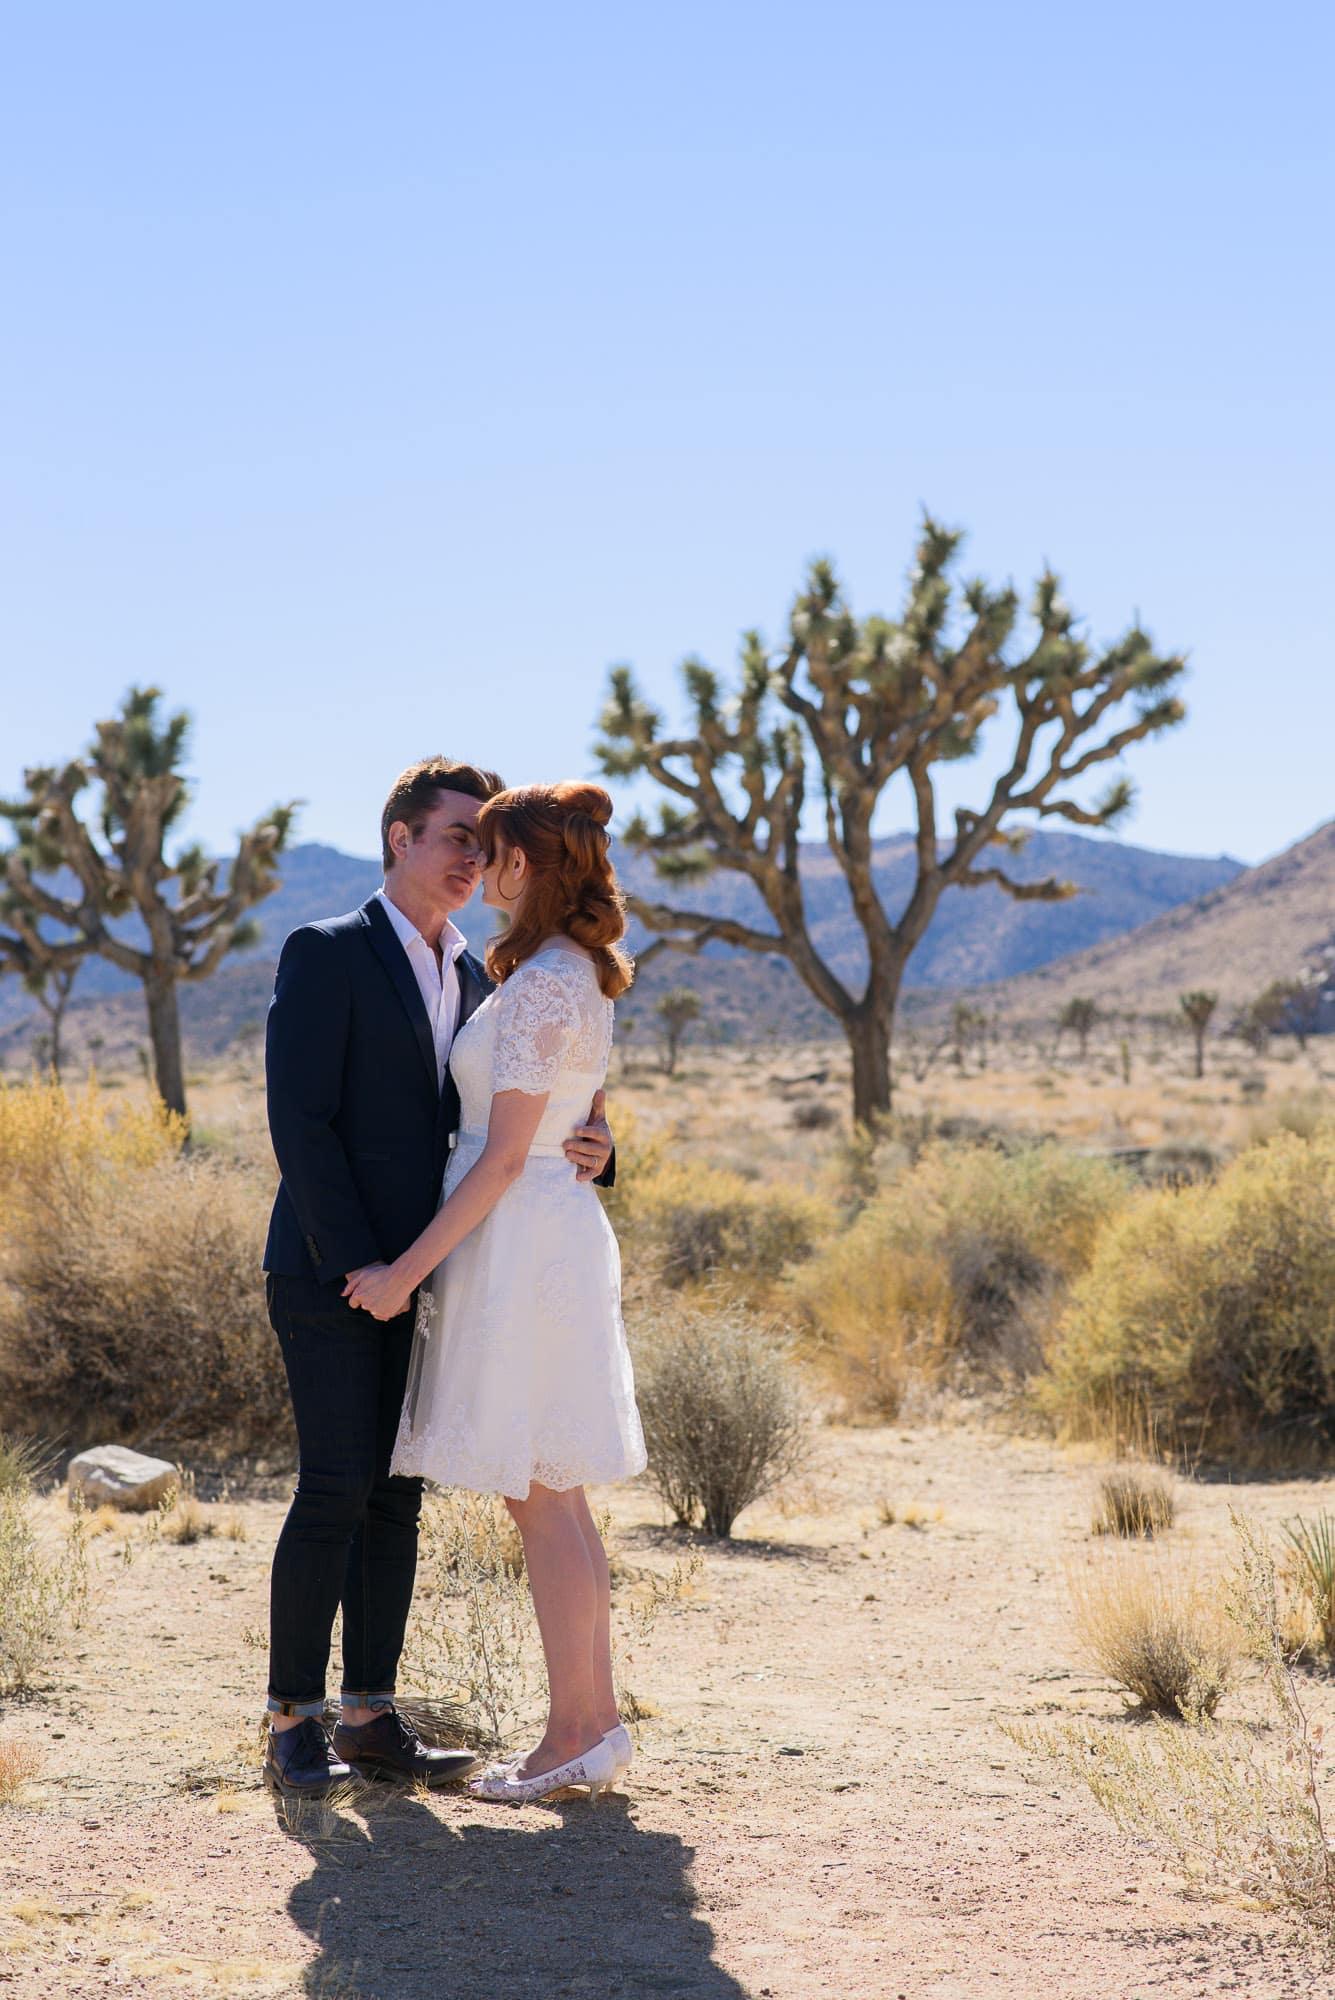 021_Alan_and_Heidi_Joshua_Tree_Destination_Wedding